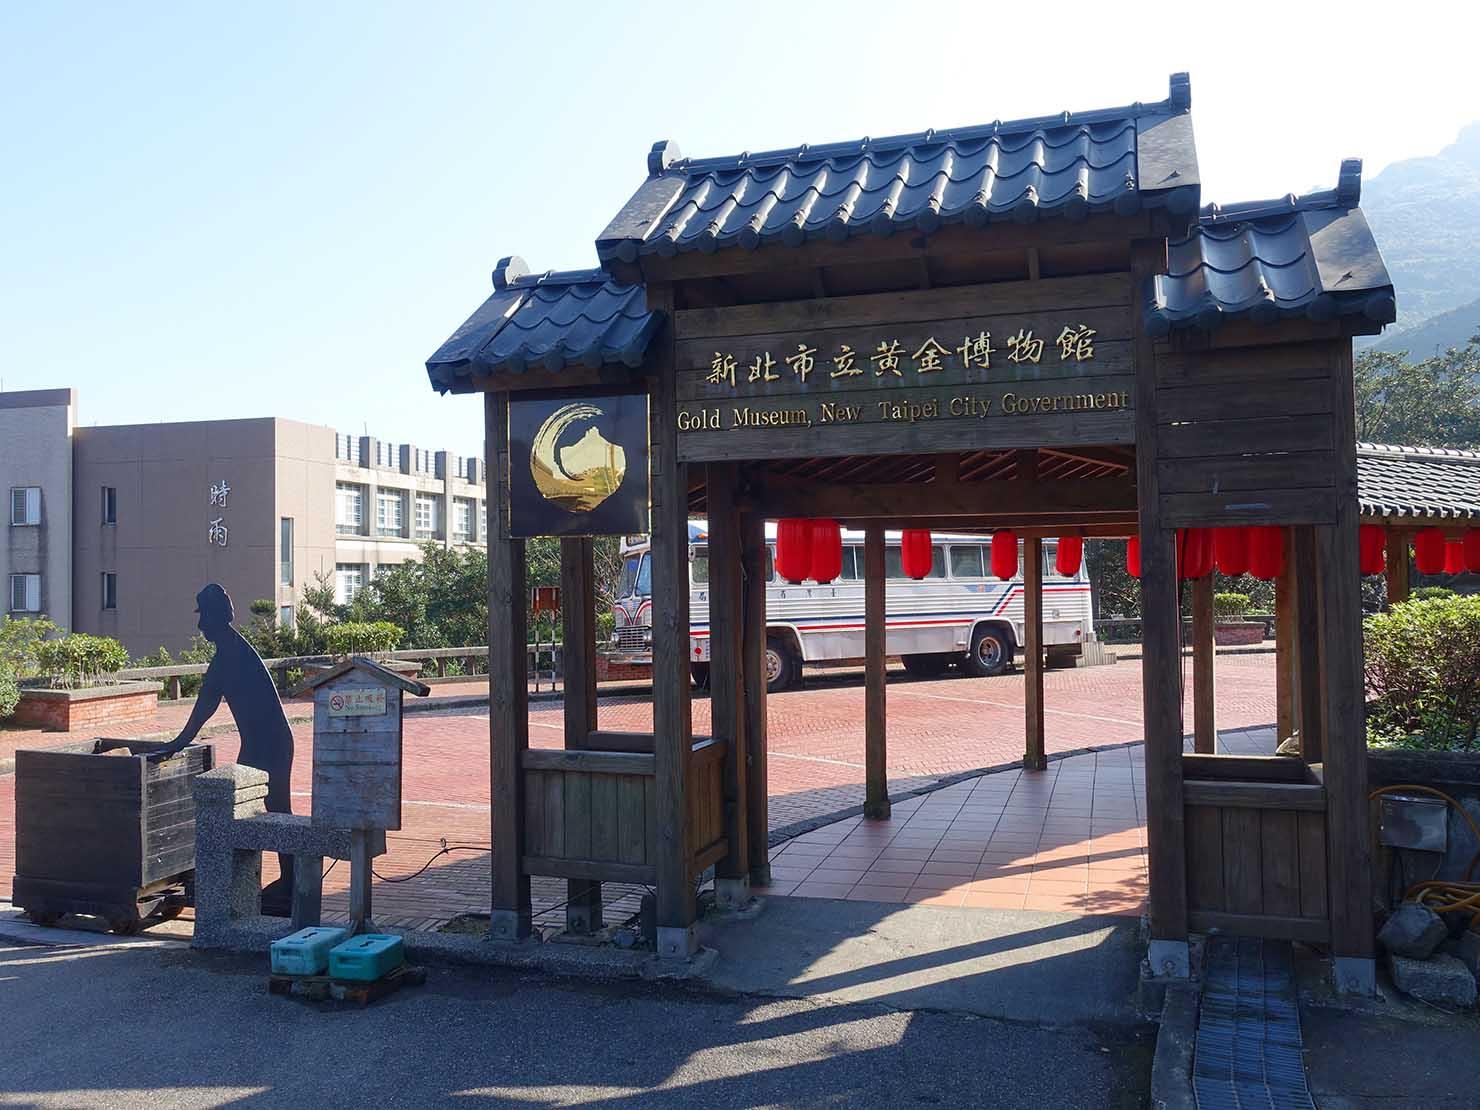 台北・金瓜石黃金博物館の入り口